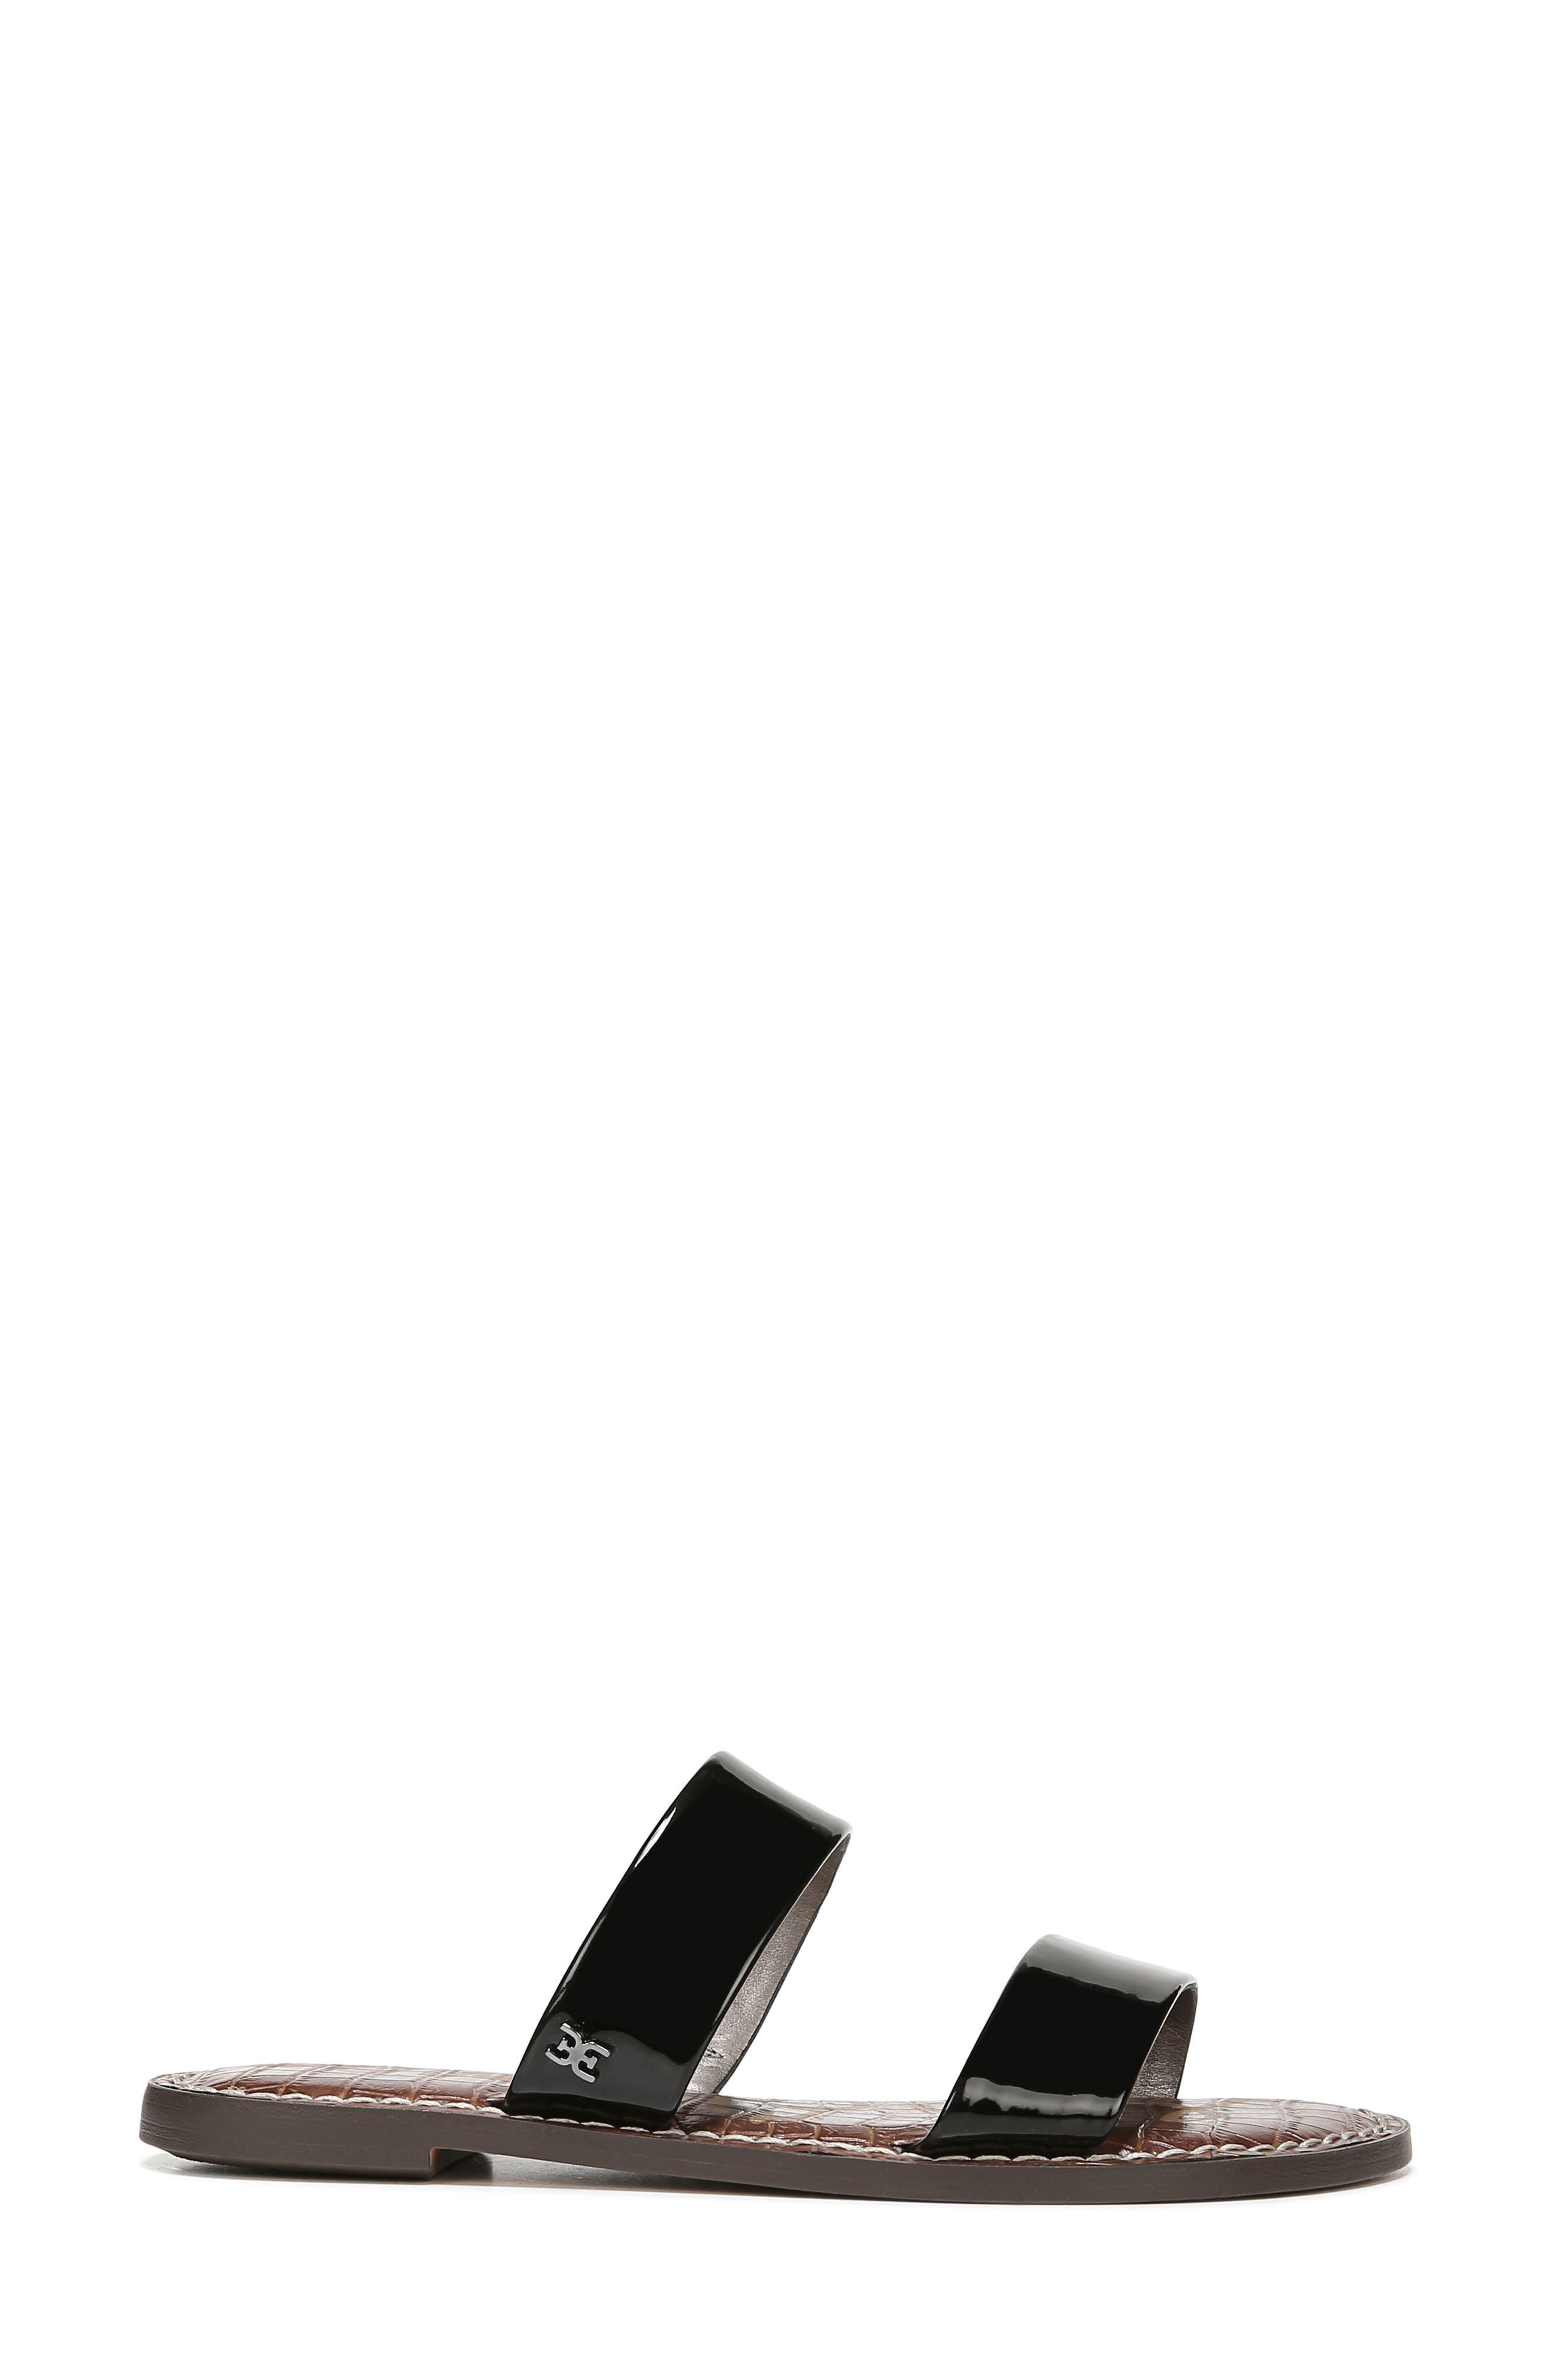 SAM EDELMAN,                             Gala Two Strap Slide Sandal,                             Alternate thumbnail 2, color,                             BLACK FAUX PATENT LEATHER